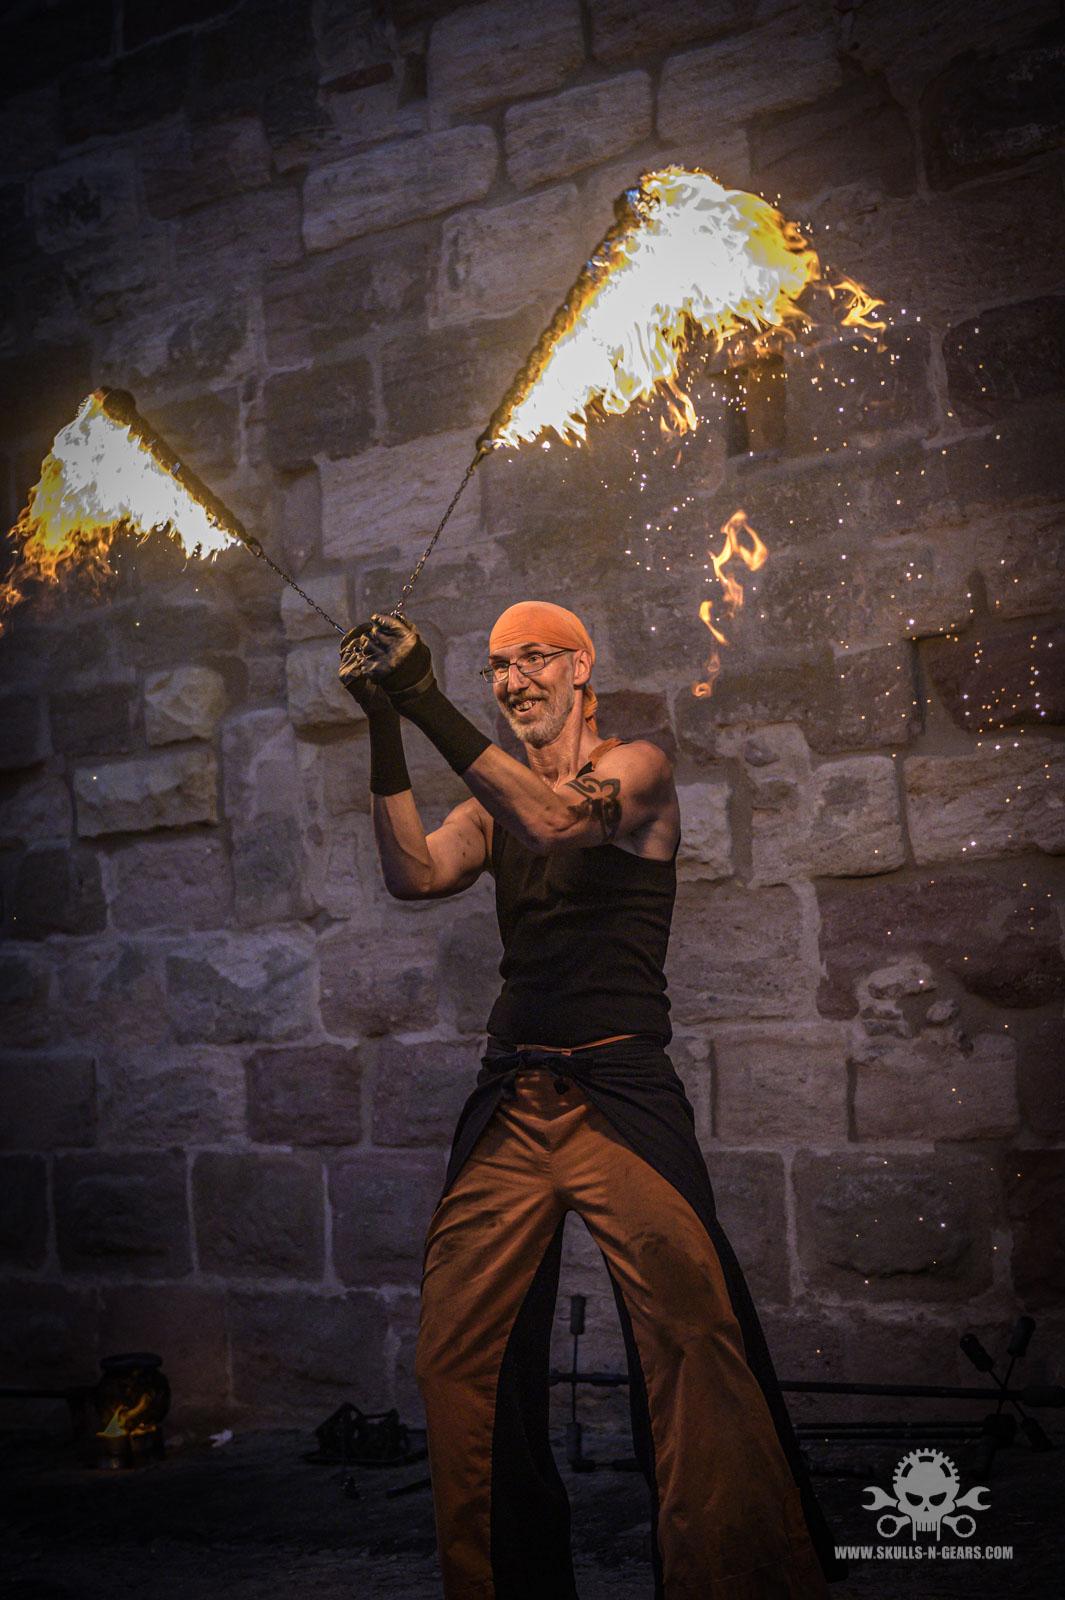 Feuertanz Festival 2019 - Feuershow-1227